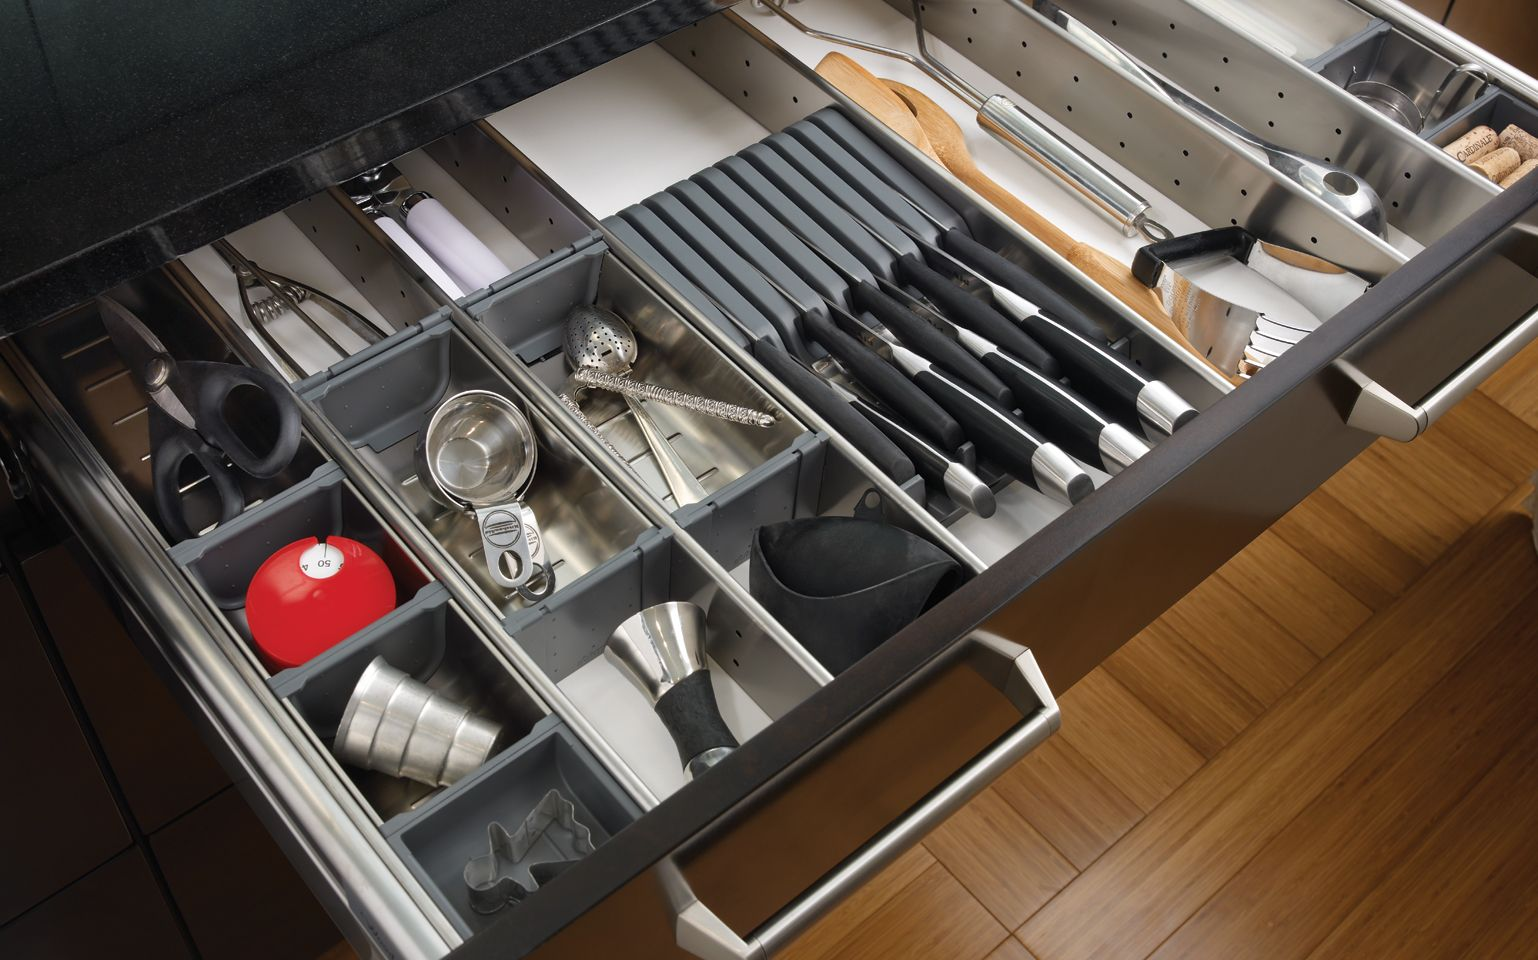 Kitchen Drawer Organizers Target